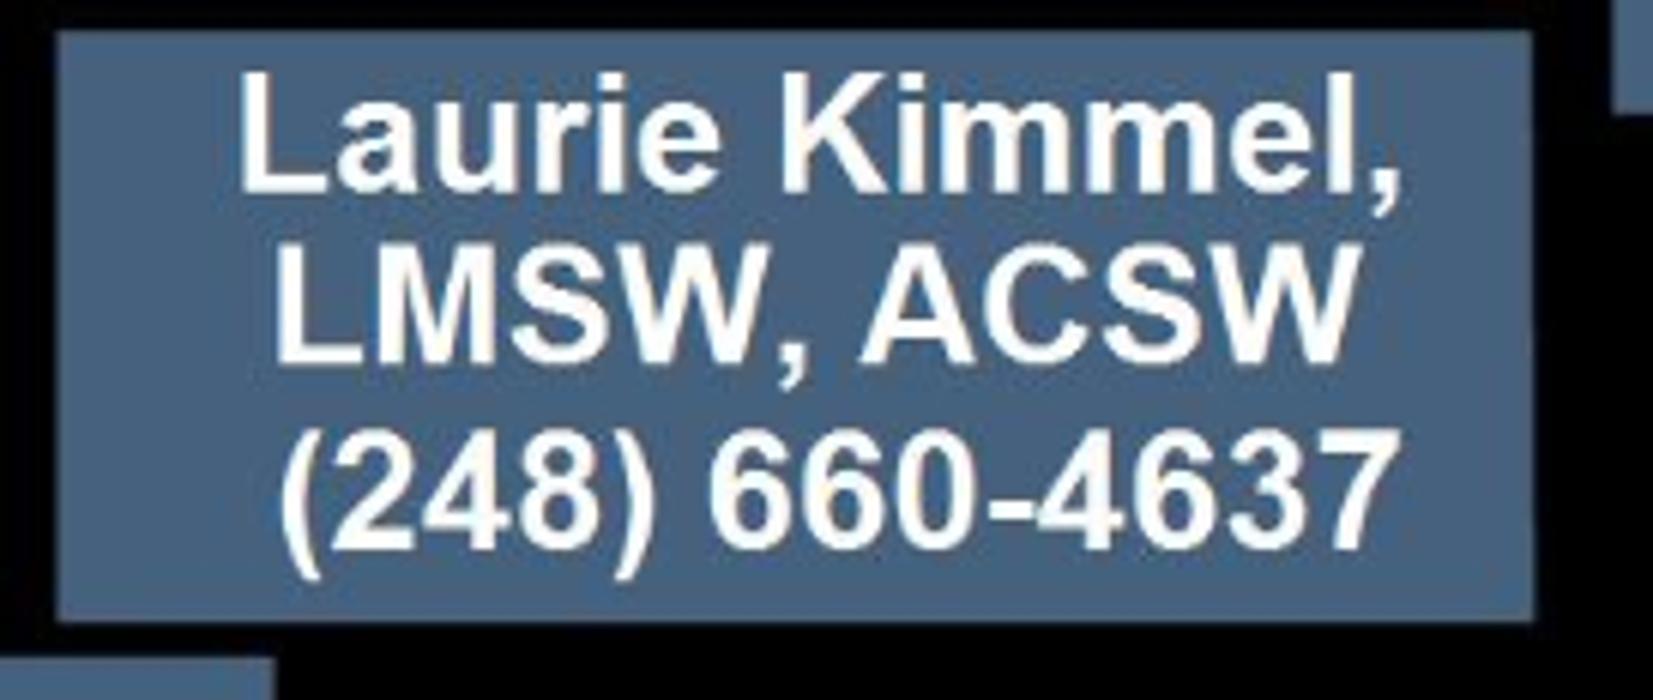 Laurie Kimmel, LMSW, ACSW - West Bloomfield, MI